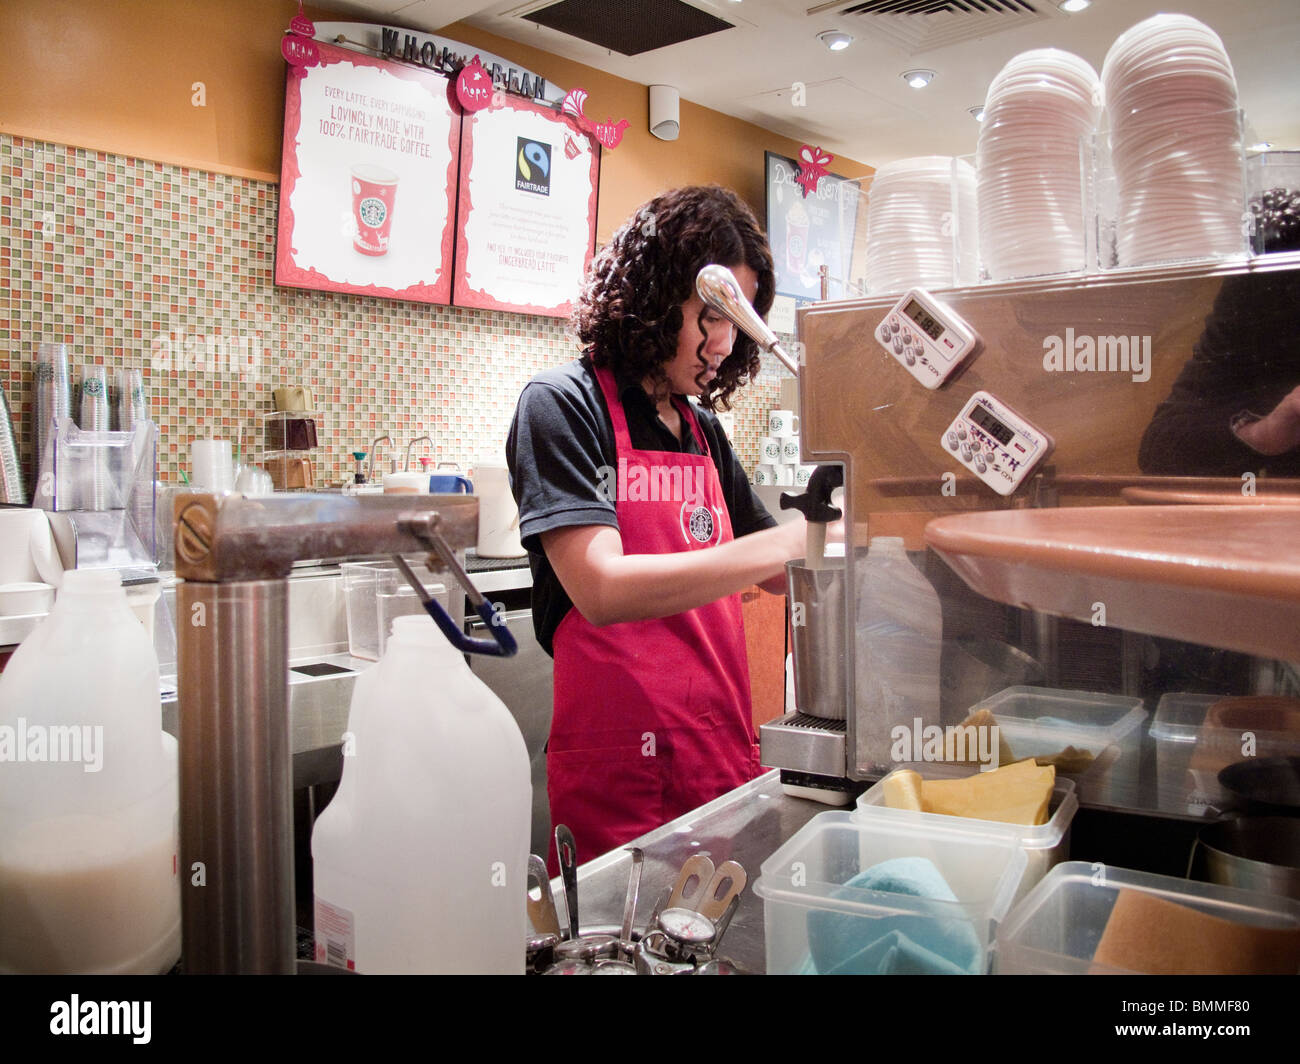 Starbucks Coffee Shop Barista At Worklondonuk Stock Photo